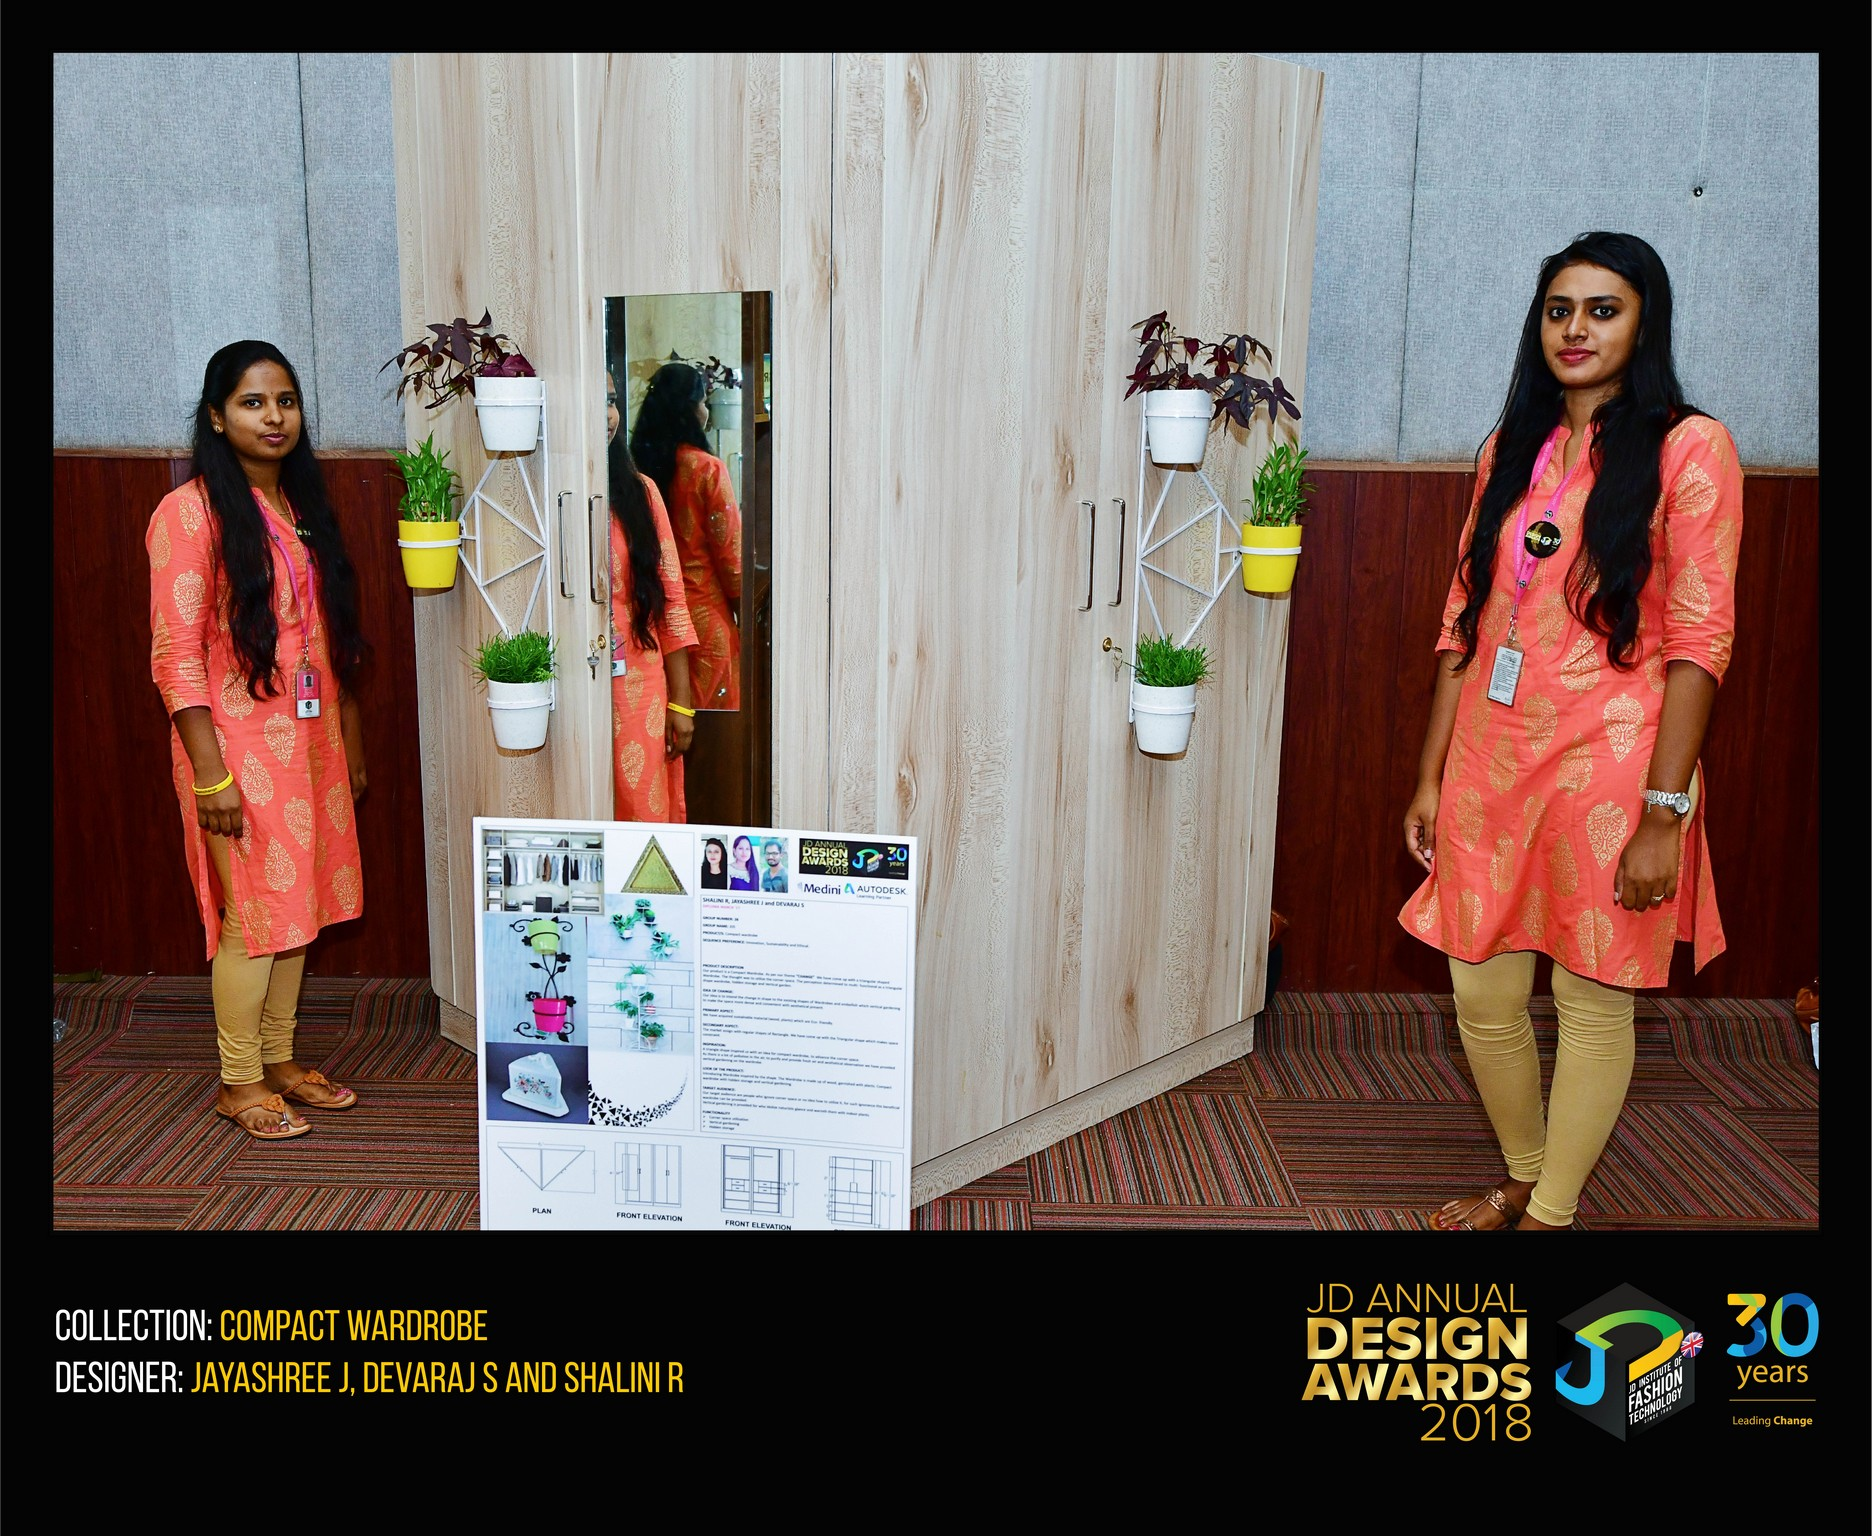 compact wardrobe Compact wardrobe – Change – JD Annual Design Awards 2018 compact wordrobe